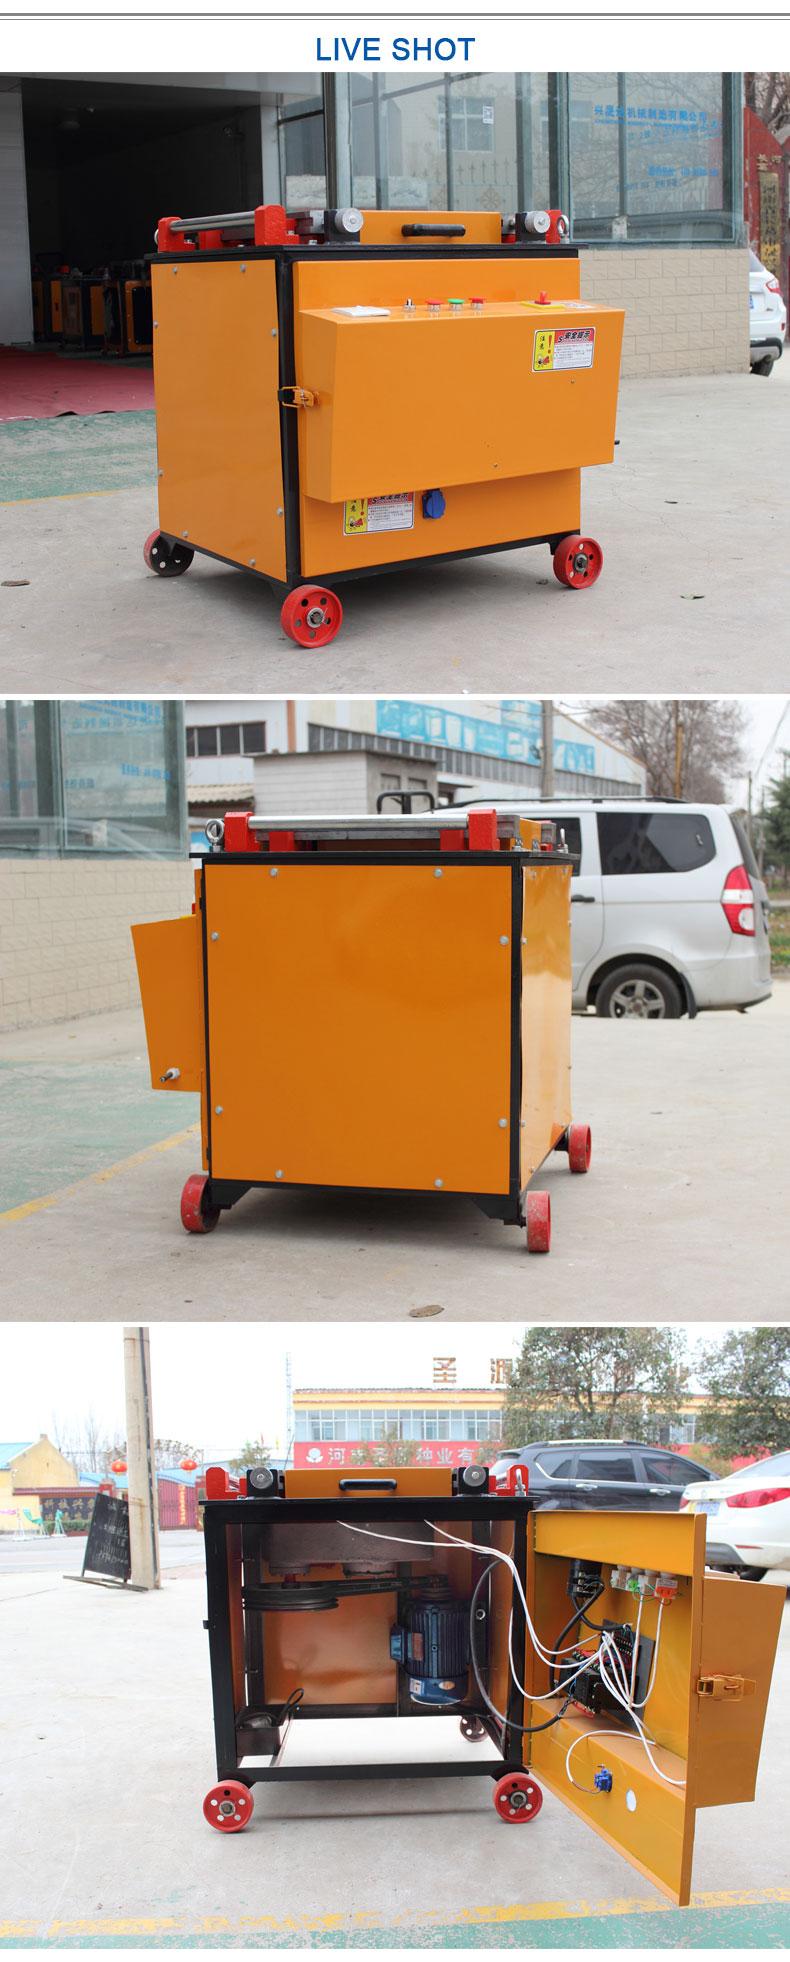 GW42 automática del cnc bar máquina dobladora de bar de flexión de acero máquina dobladora de tubo redondo de barra de acero de la máquina de flexión de bender